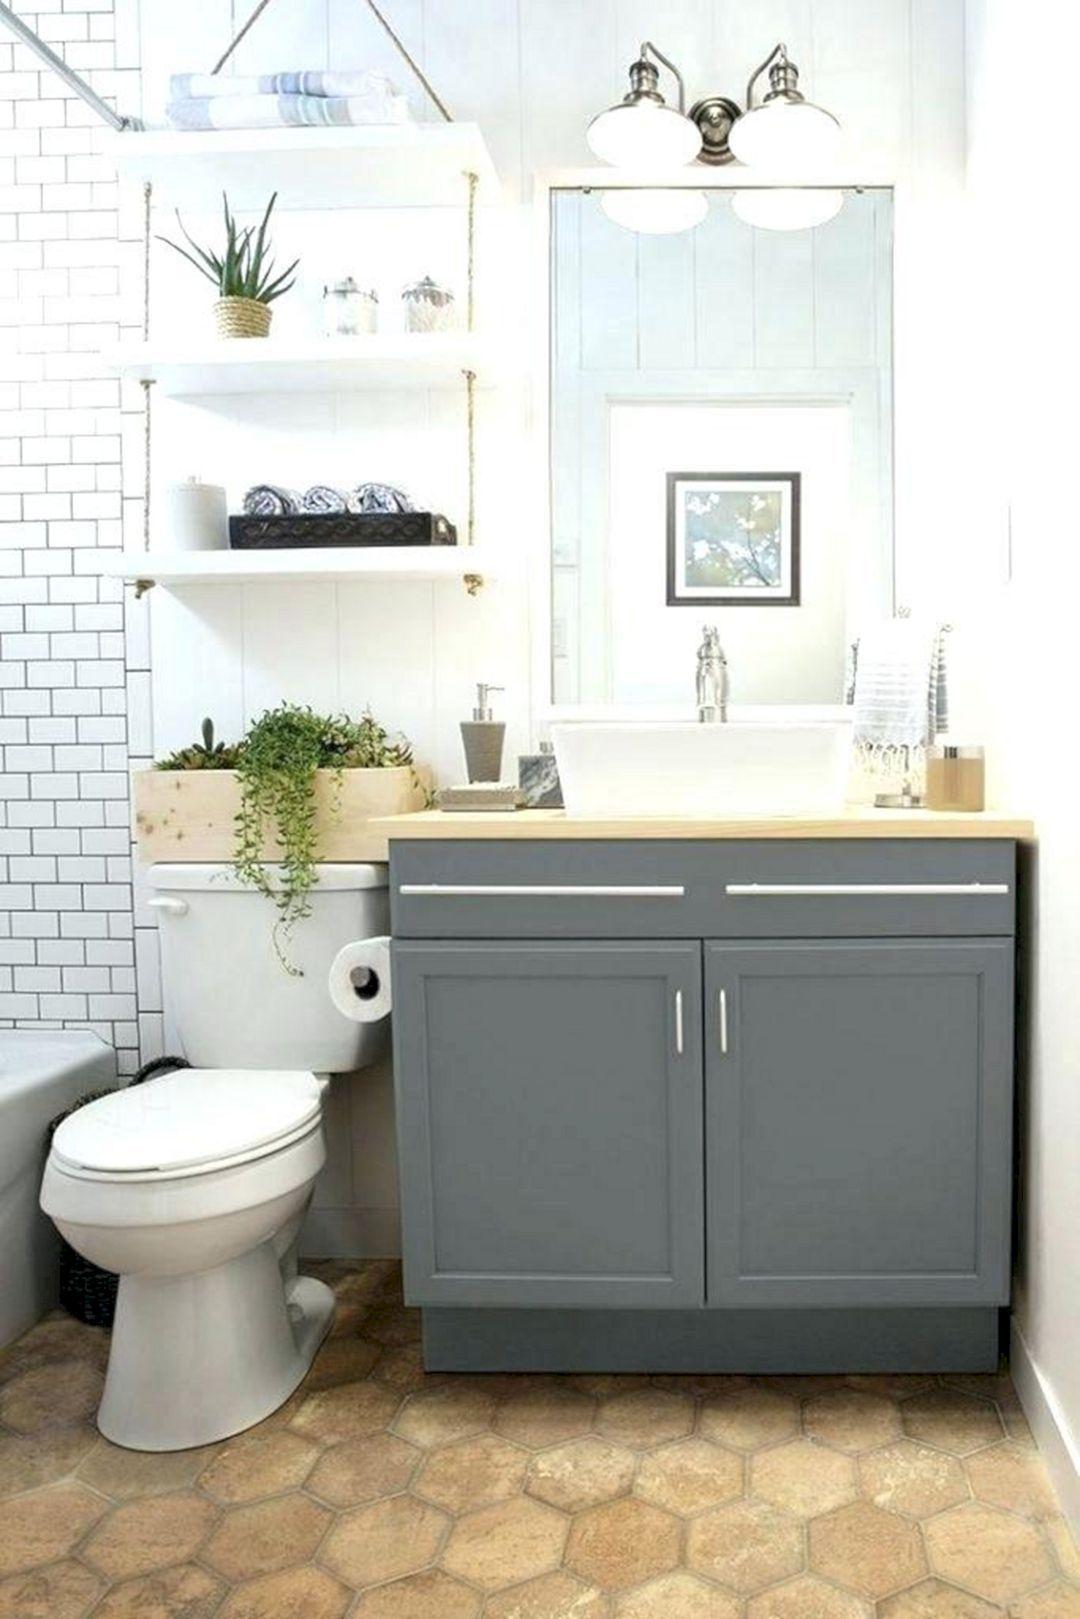 20 Impressive Small Bathroom Wall Storage Ideas Small Space Bathroom Small Space Bathroom Vanity Small Apartment Bathroom